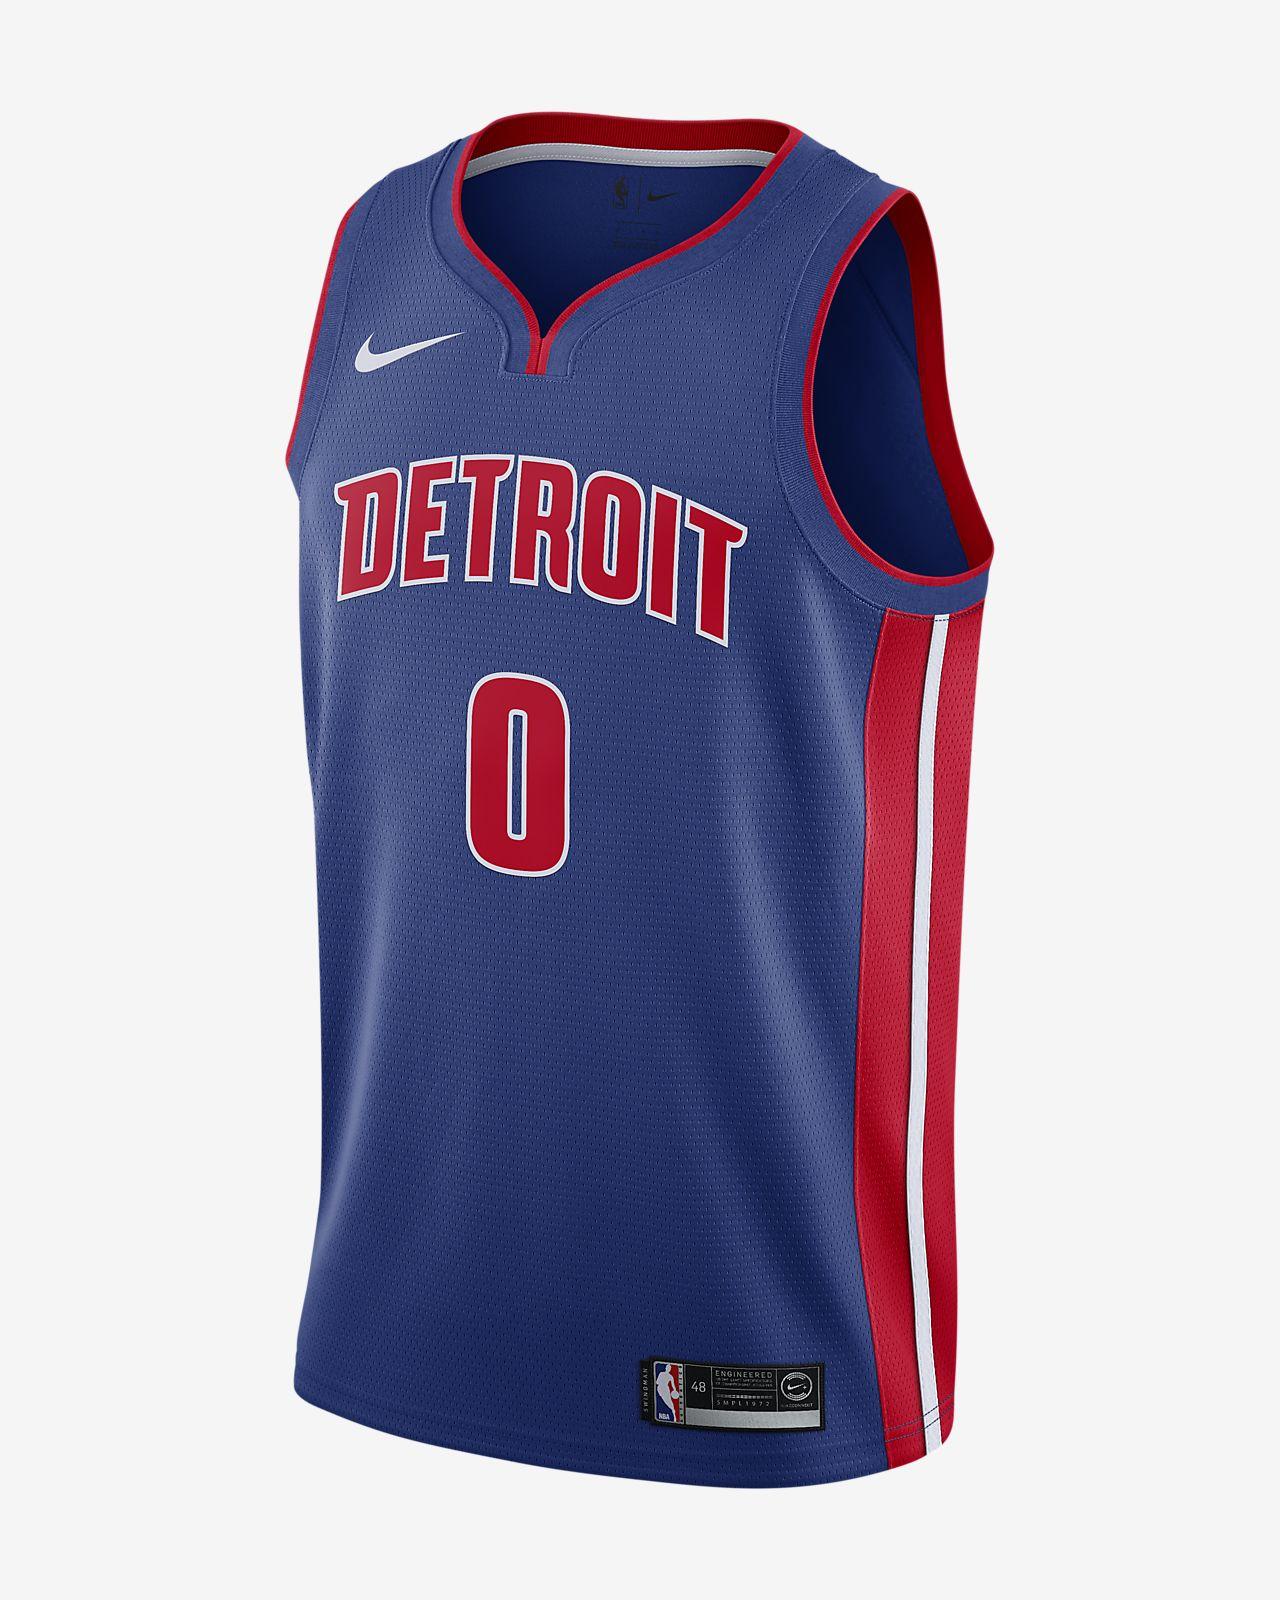 Camiseta Nike NBA Swingman Andre Drummond Pistons Icon Edition